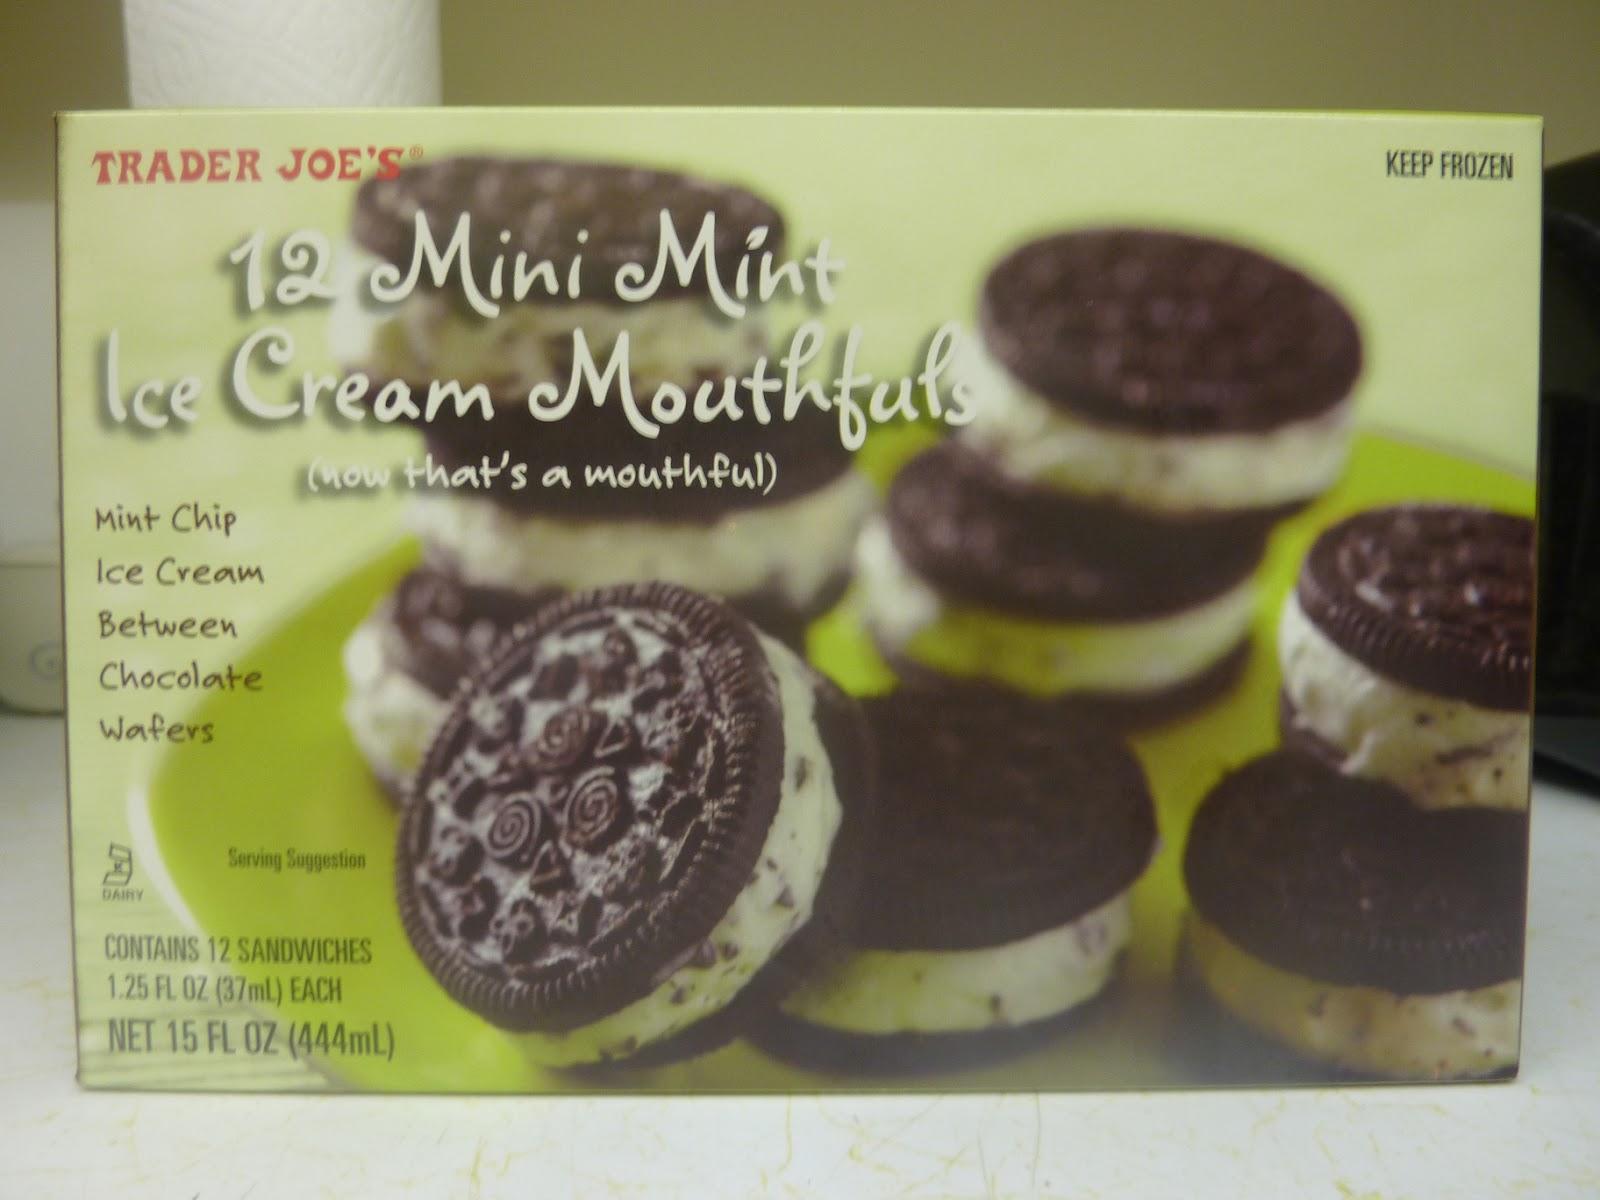 What's Good at Trader Joe's?: Trader Joe's Mini Mint Ice Cream ...